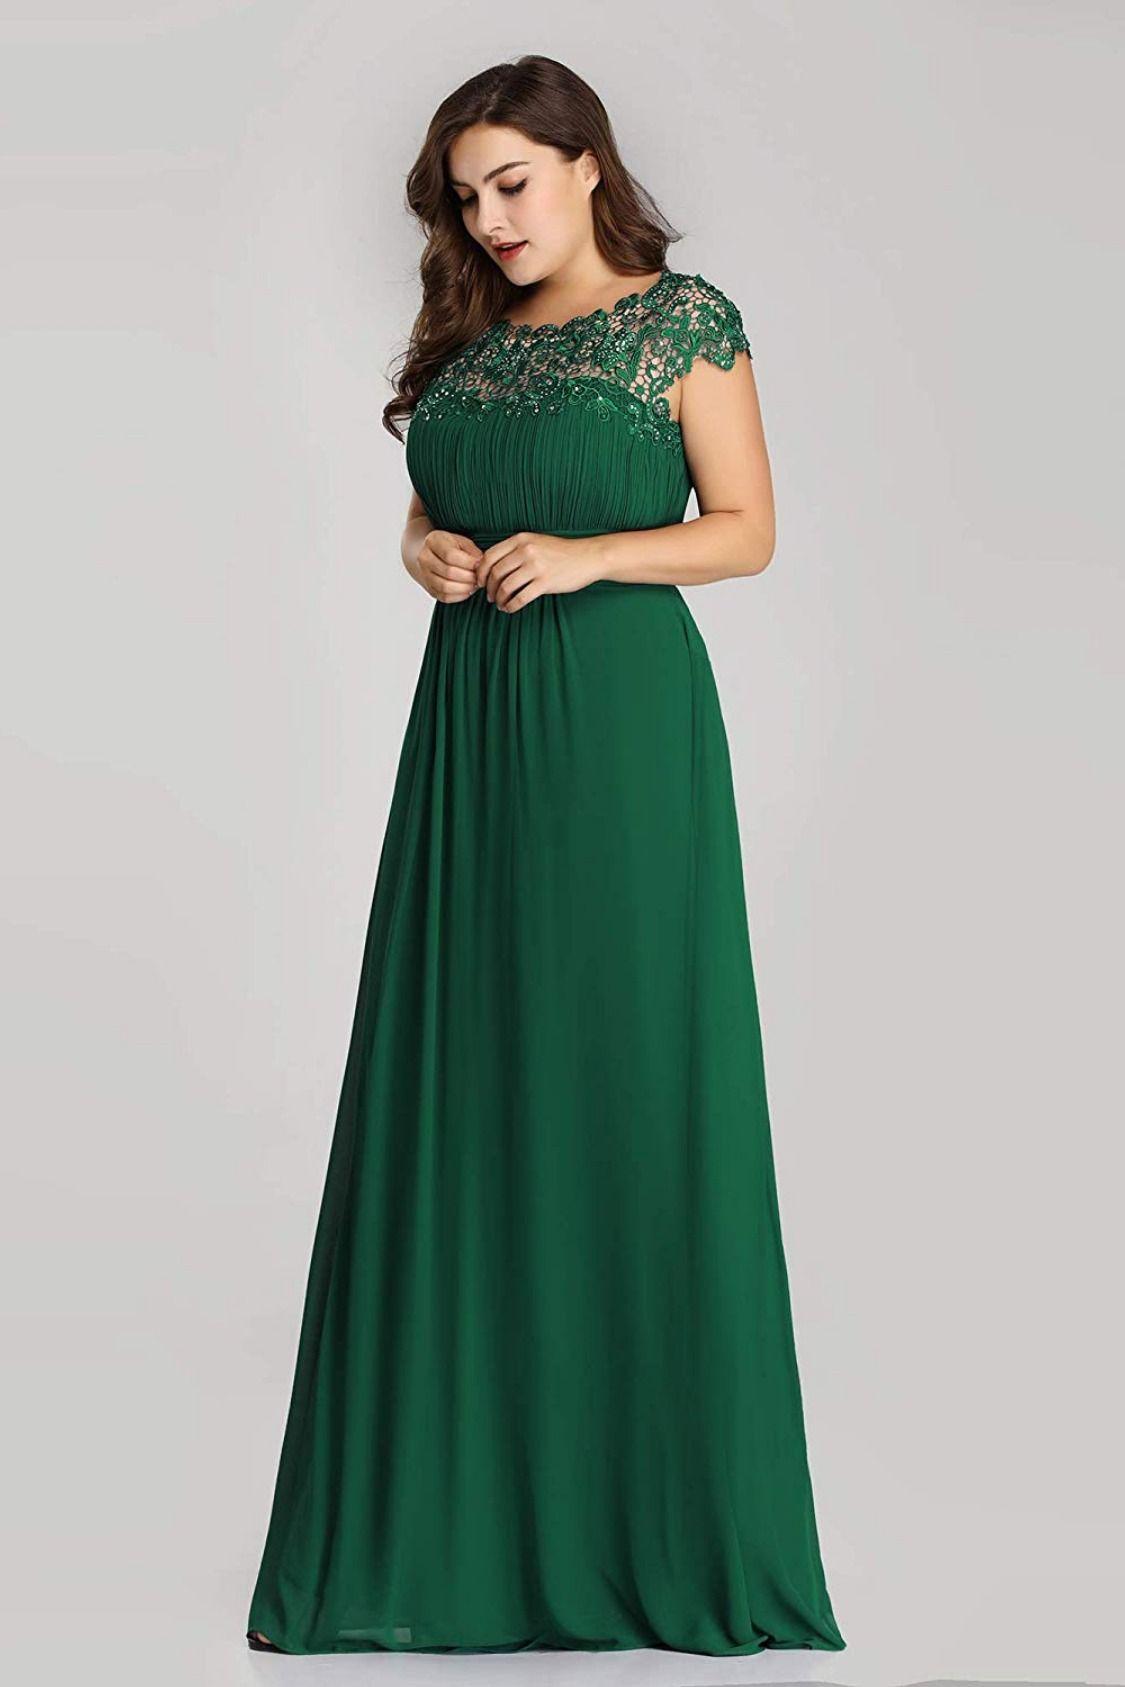 Women/'s Plus Size Formal Evening Lace Long Maxi Dress Party Cocktail Bridesmaid